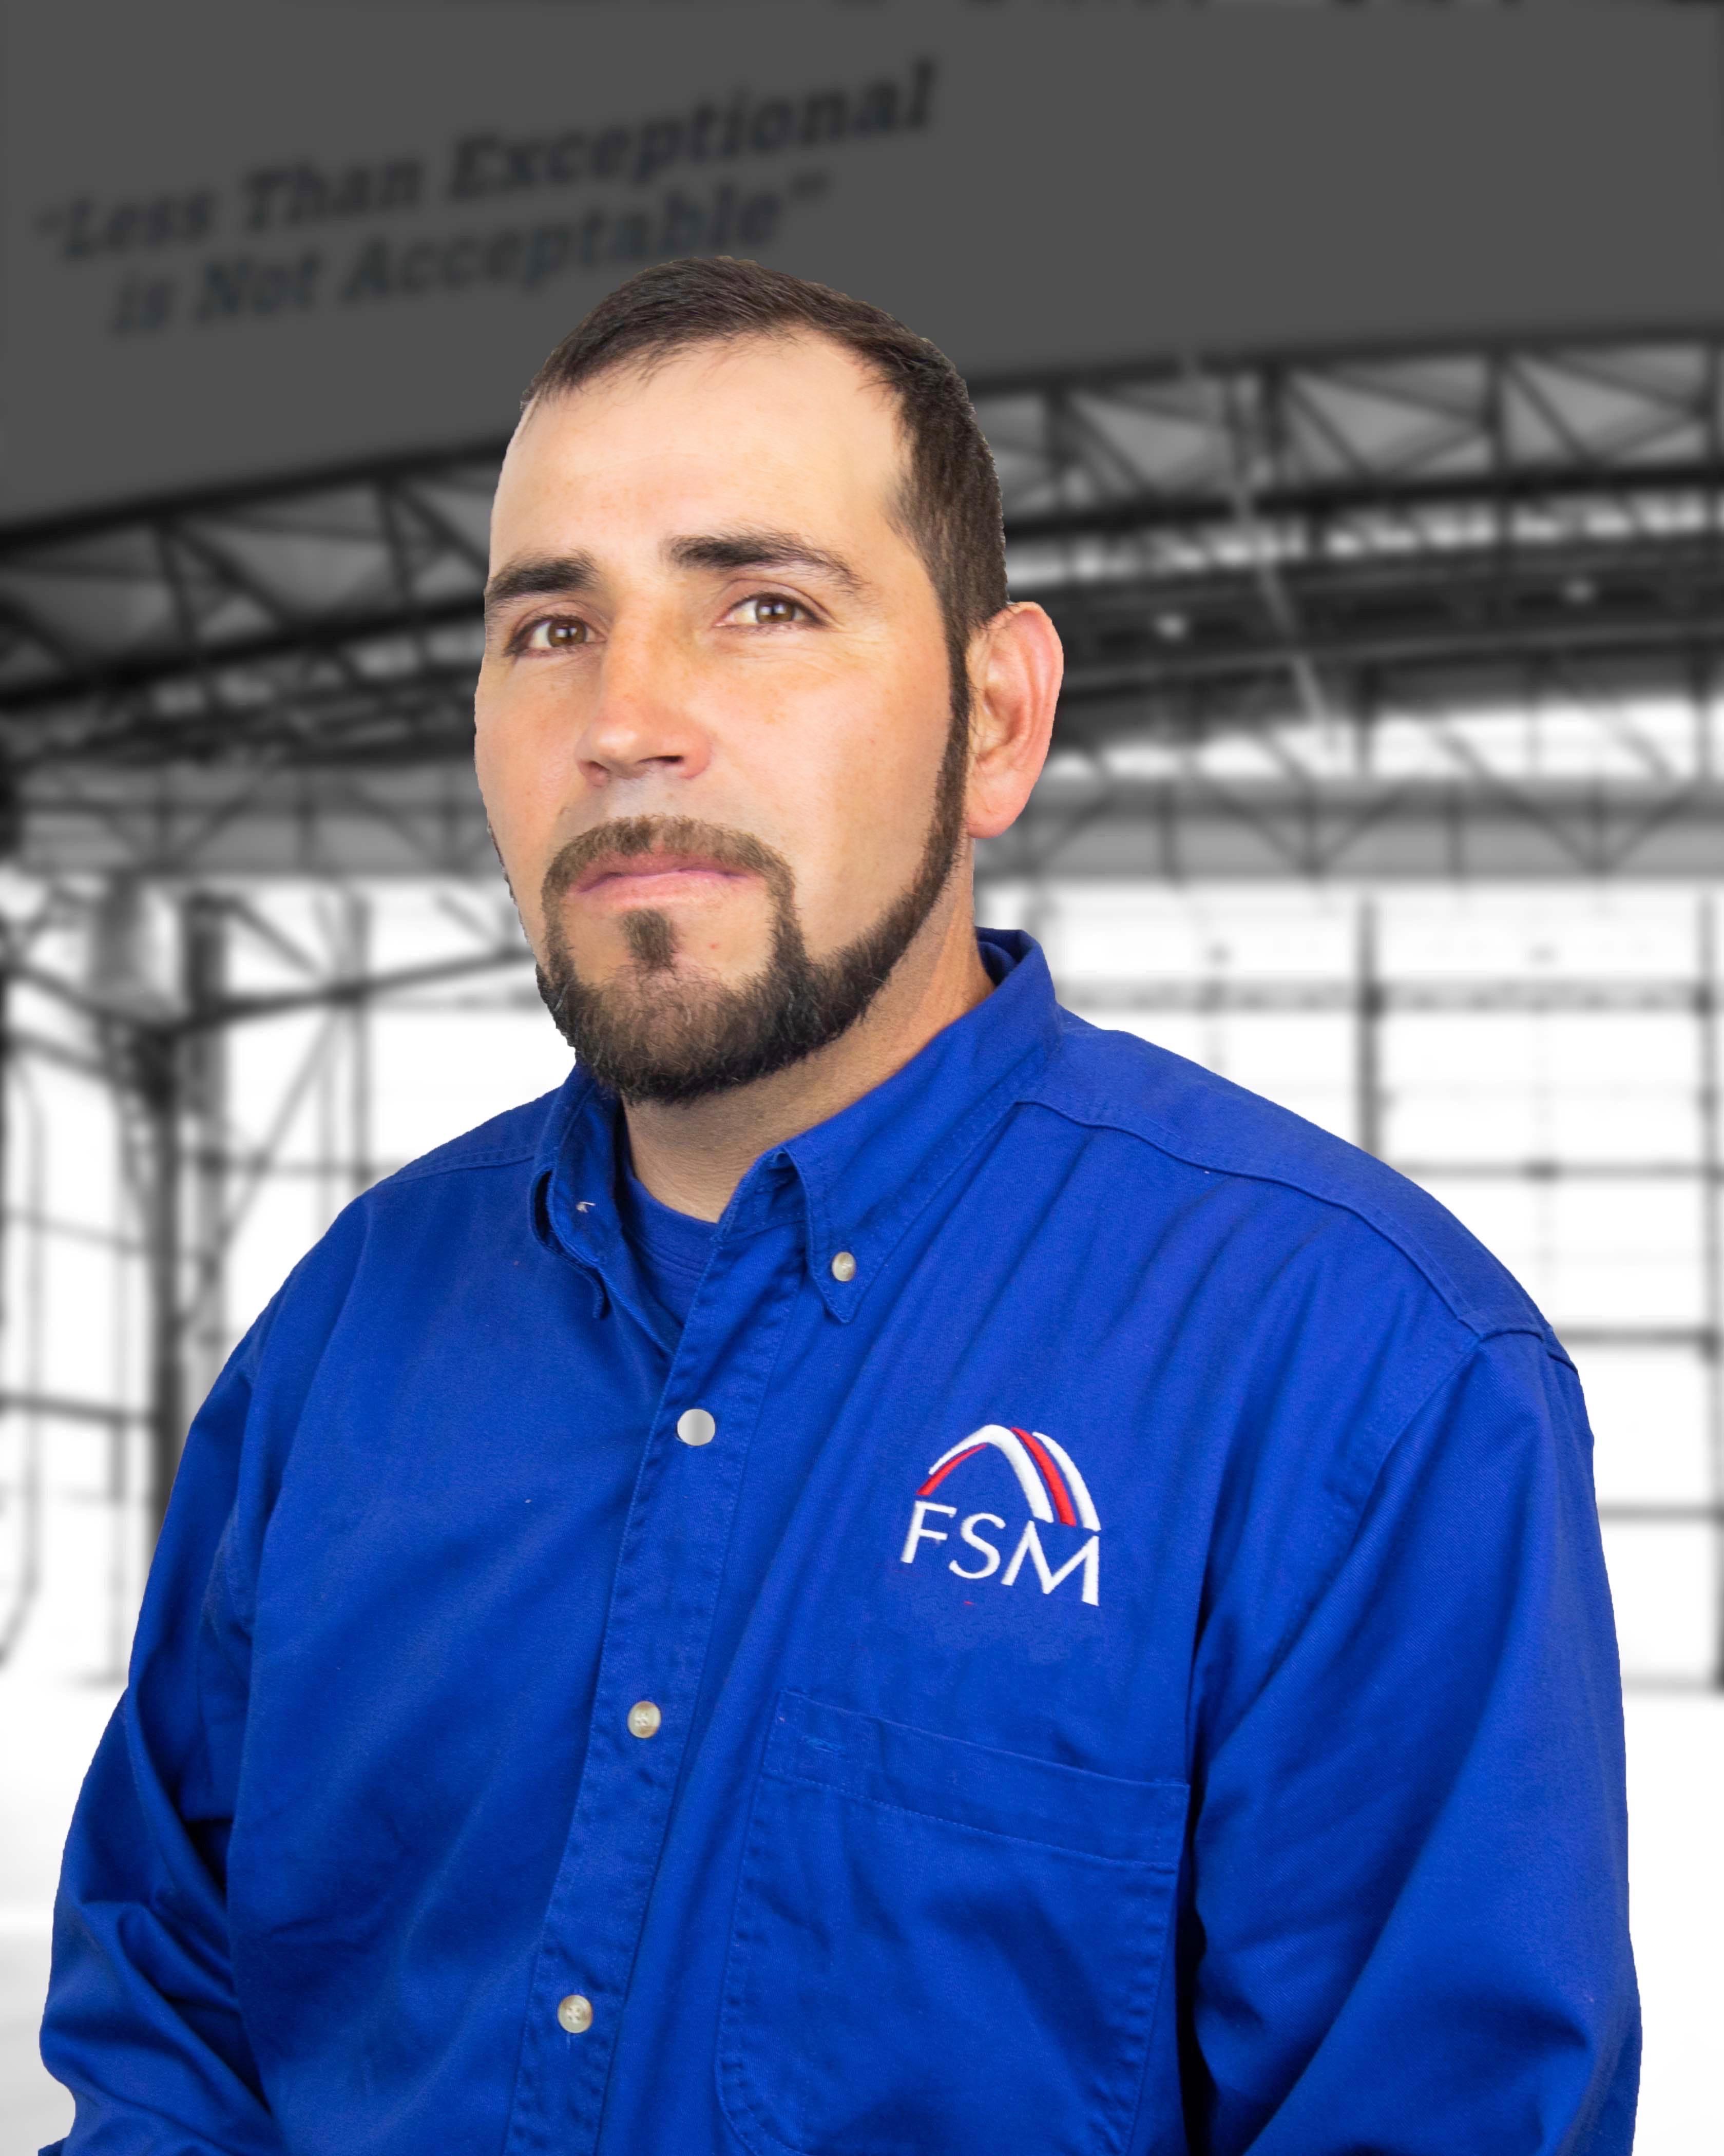 FSM Alejandro DeLaTorre Foreman